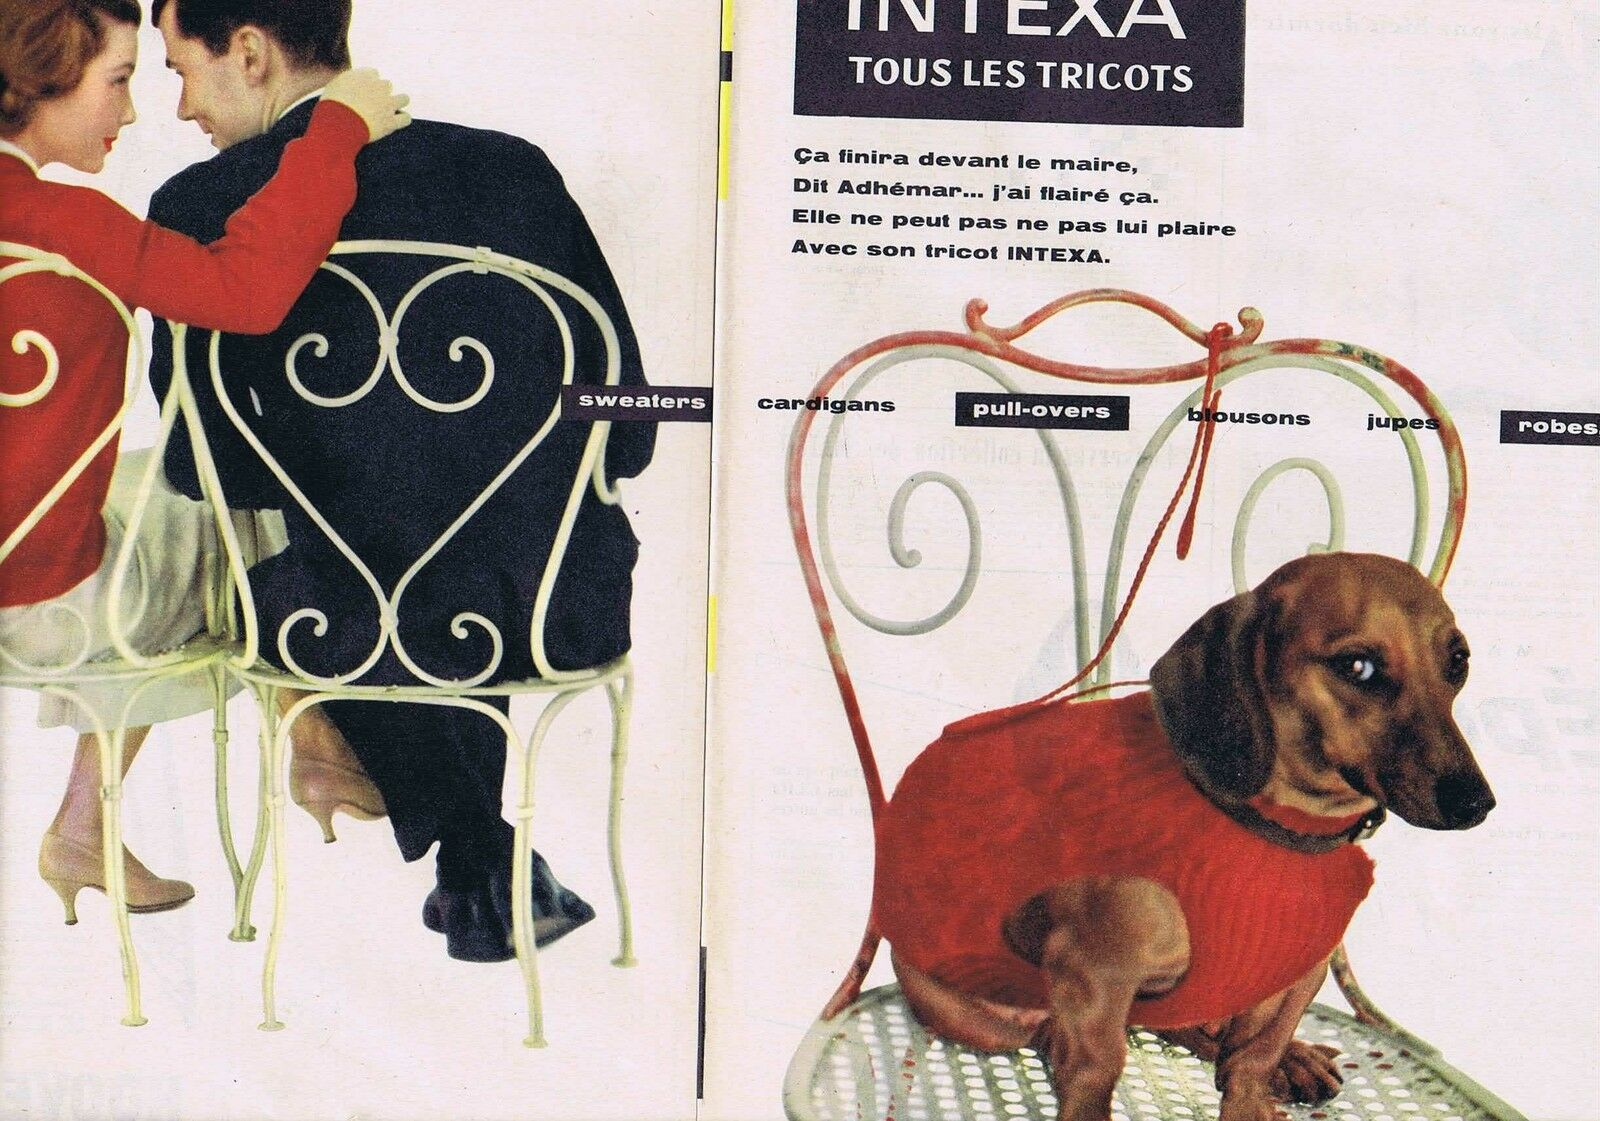 INTEXA tous les tricots 1956